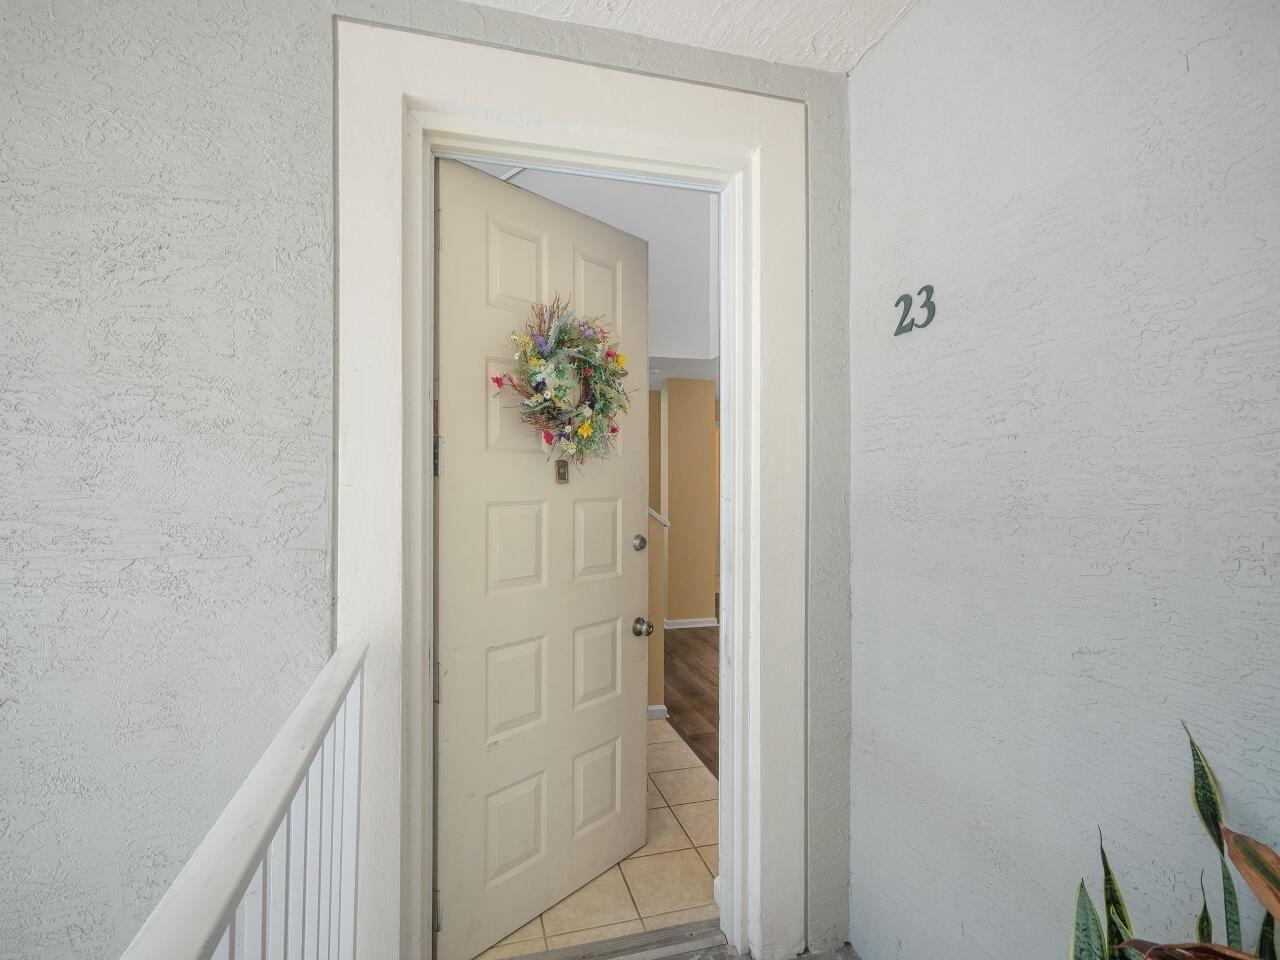 Photo of 4851 Chancellor Drive #23, Jupiter, FL 33458 (MLS # RX-10734138)